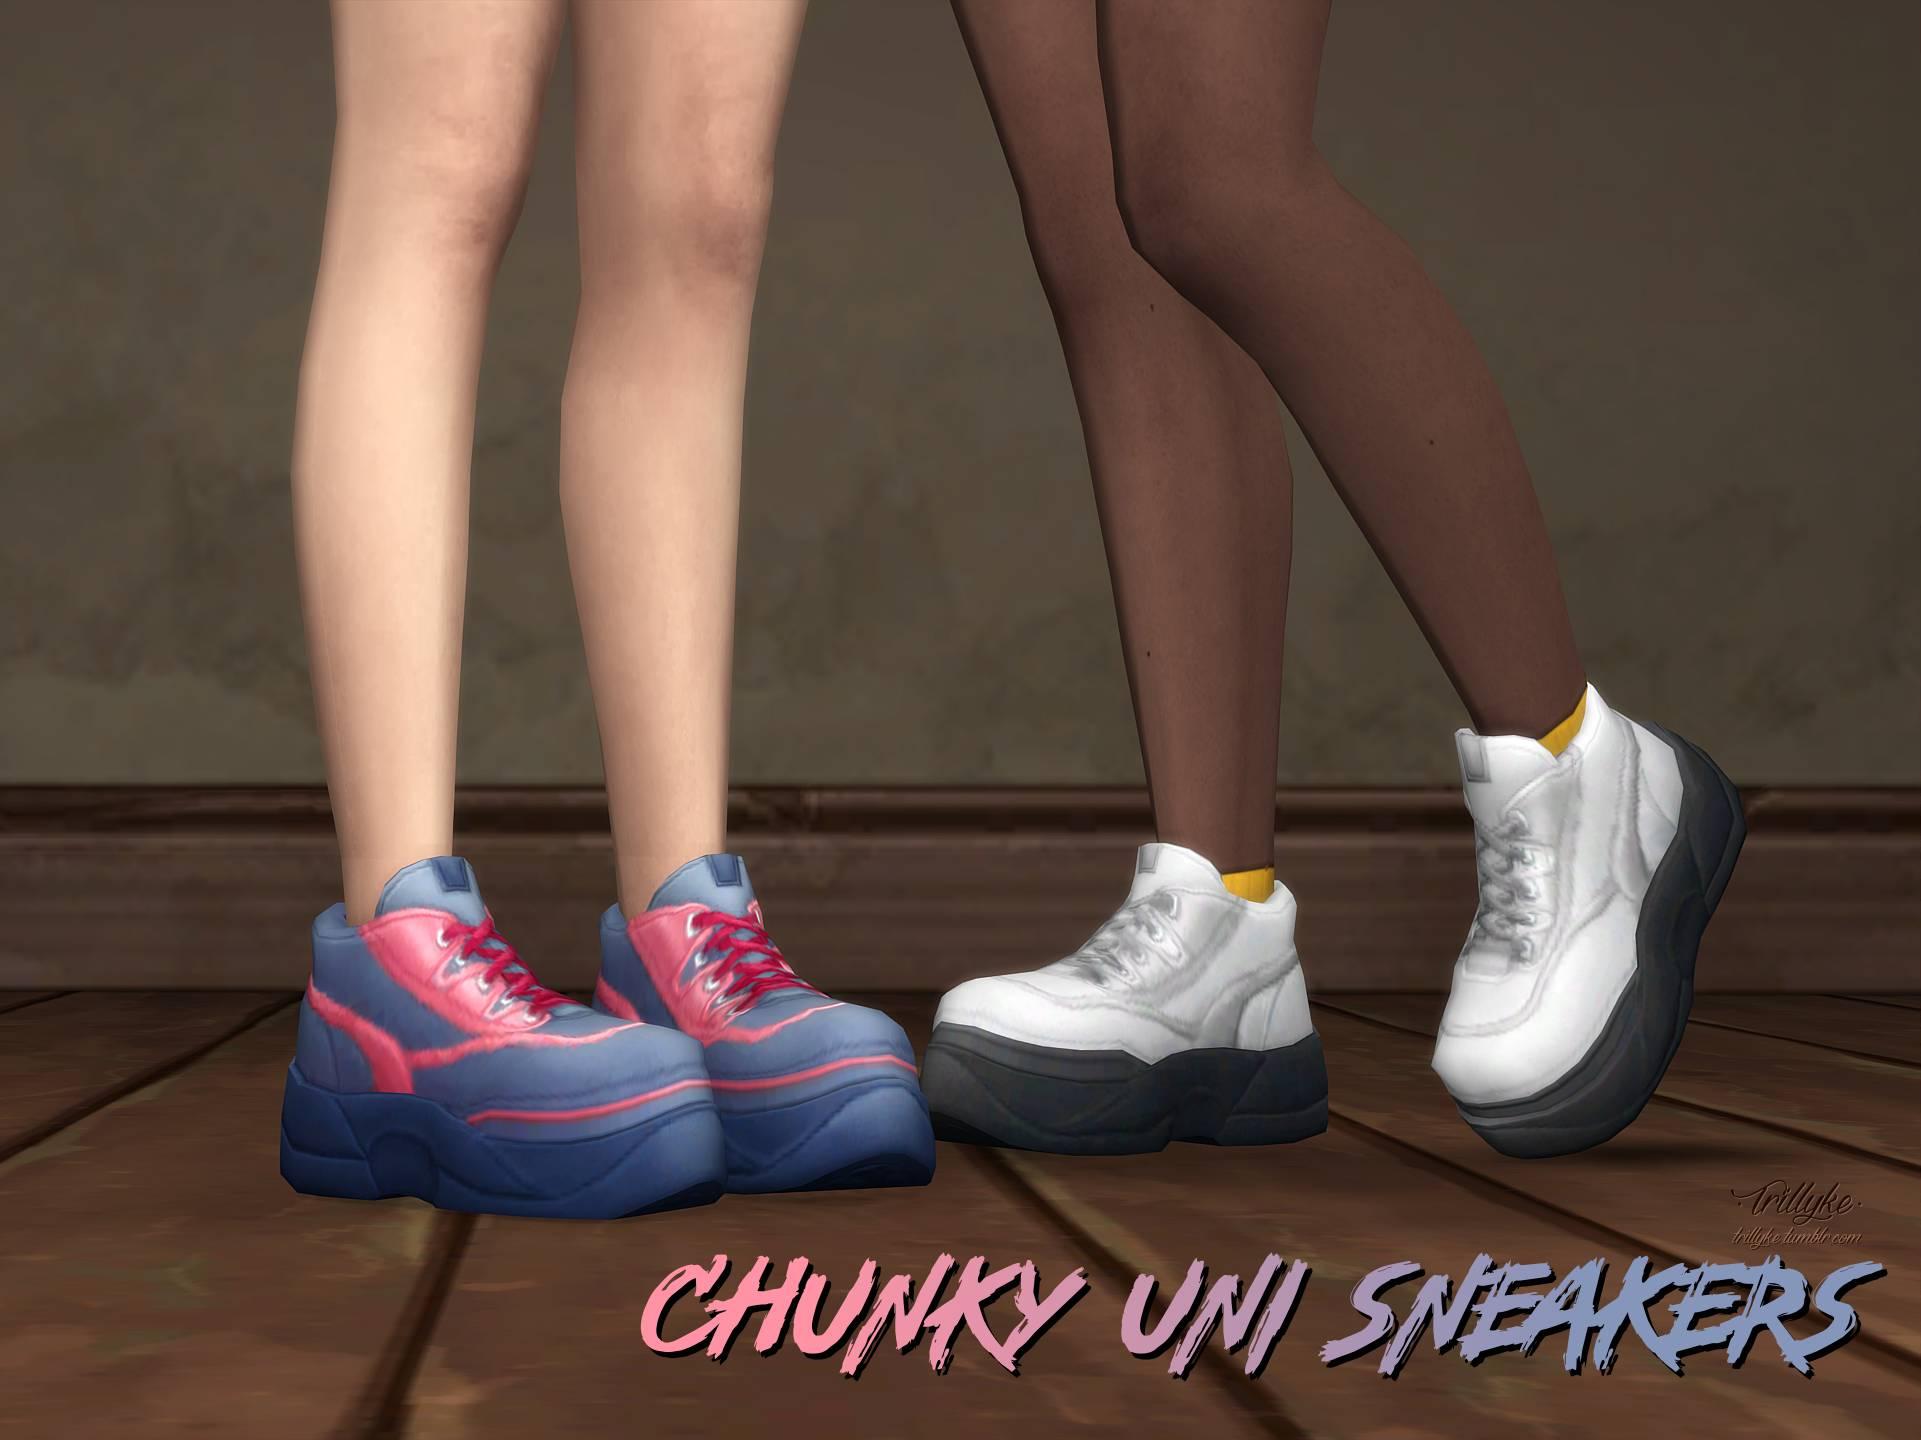 Кроссовки - Chunky Uni Sneakers